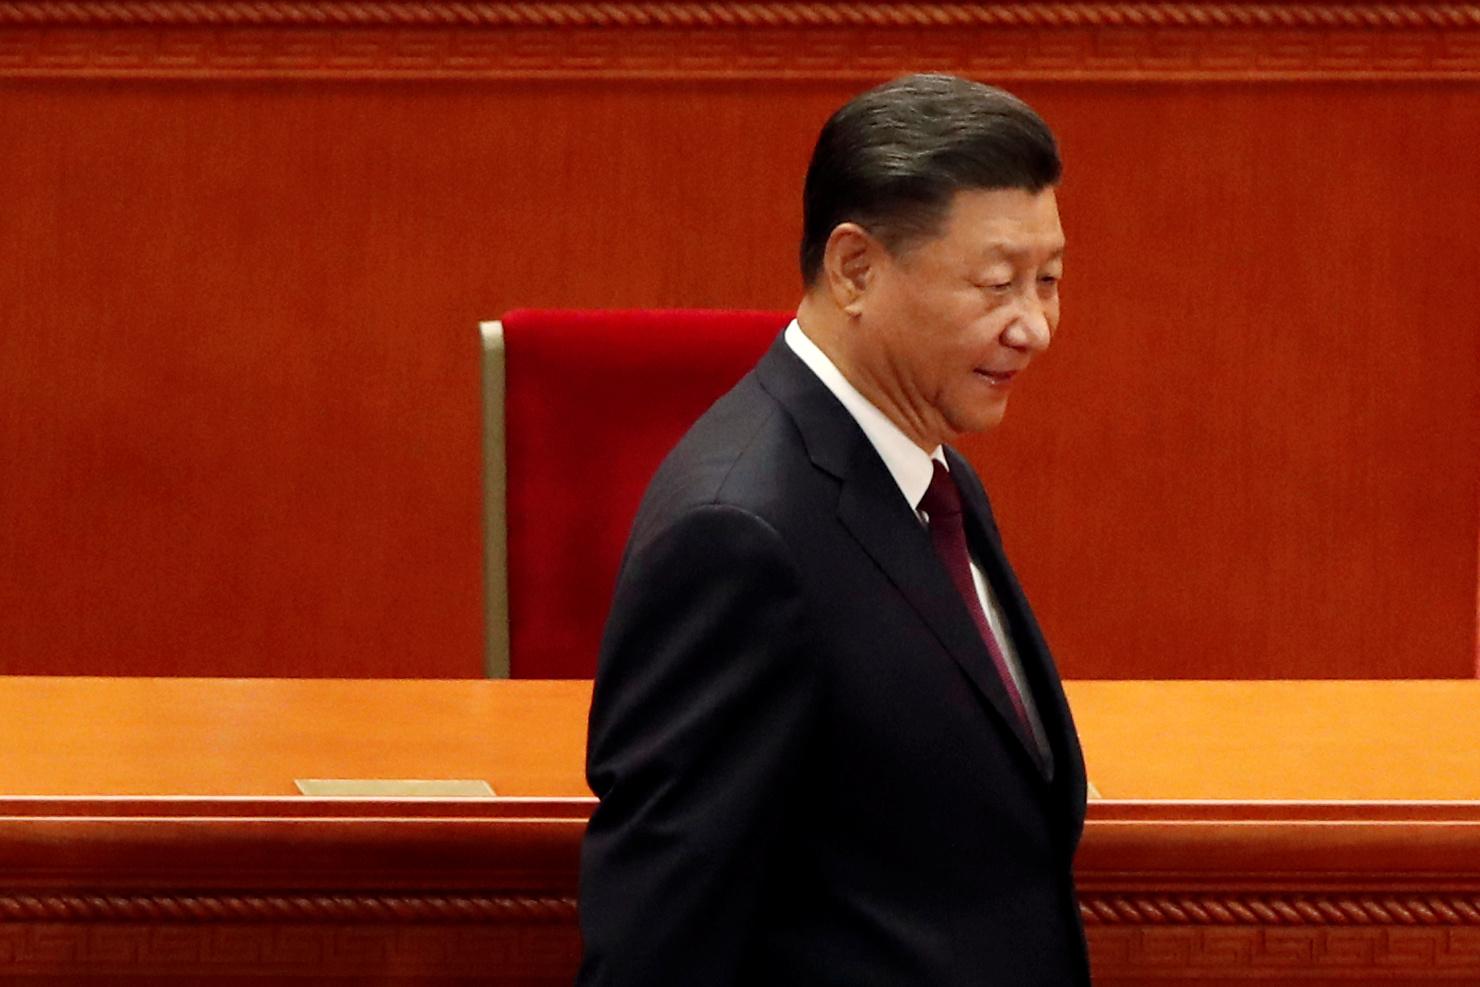 Chinese President Xi Jinping REUTERS/Carlos Garcia Rawlins